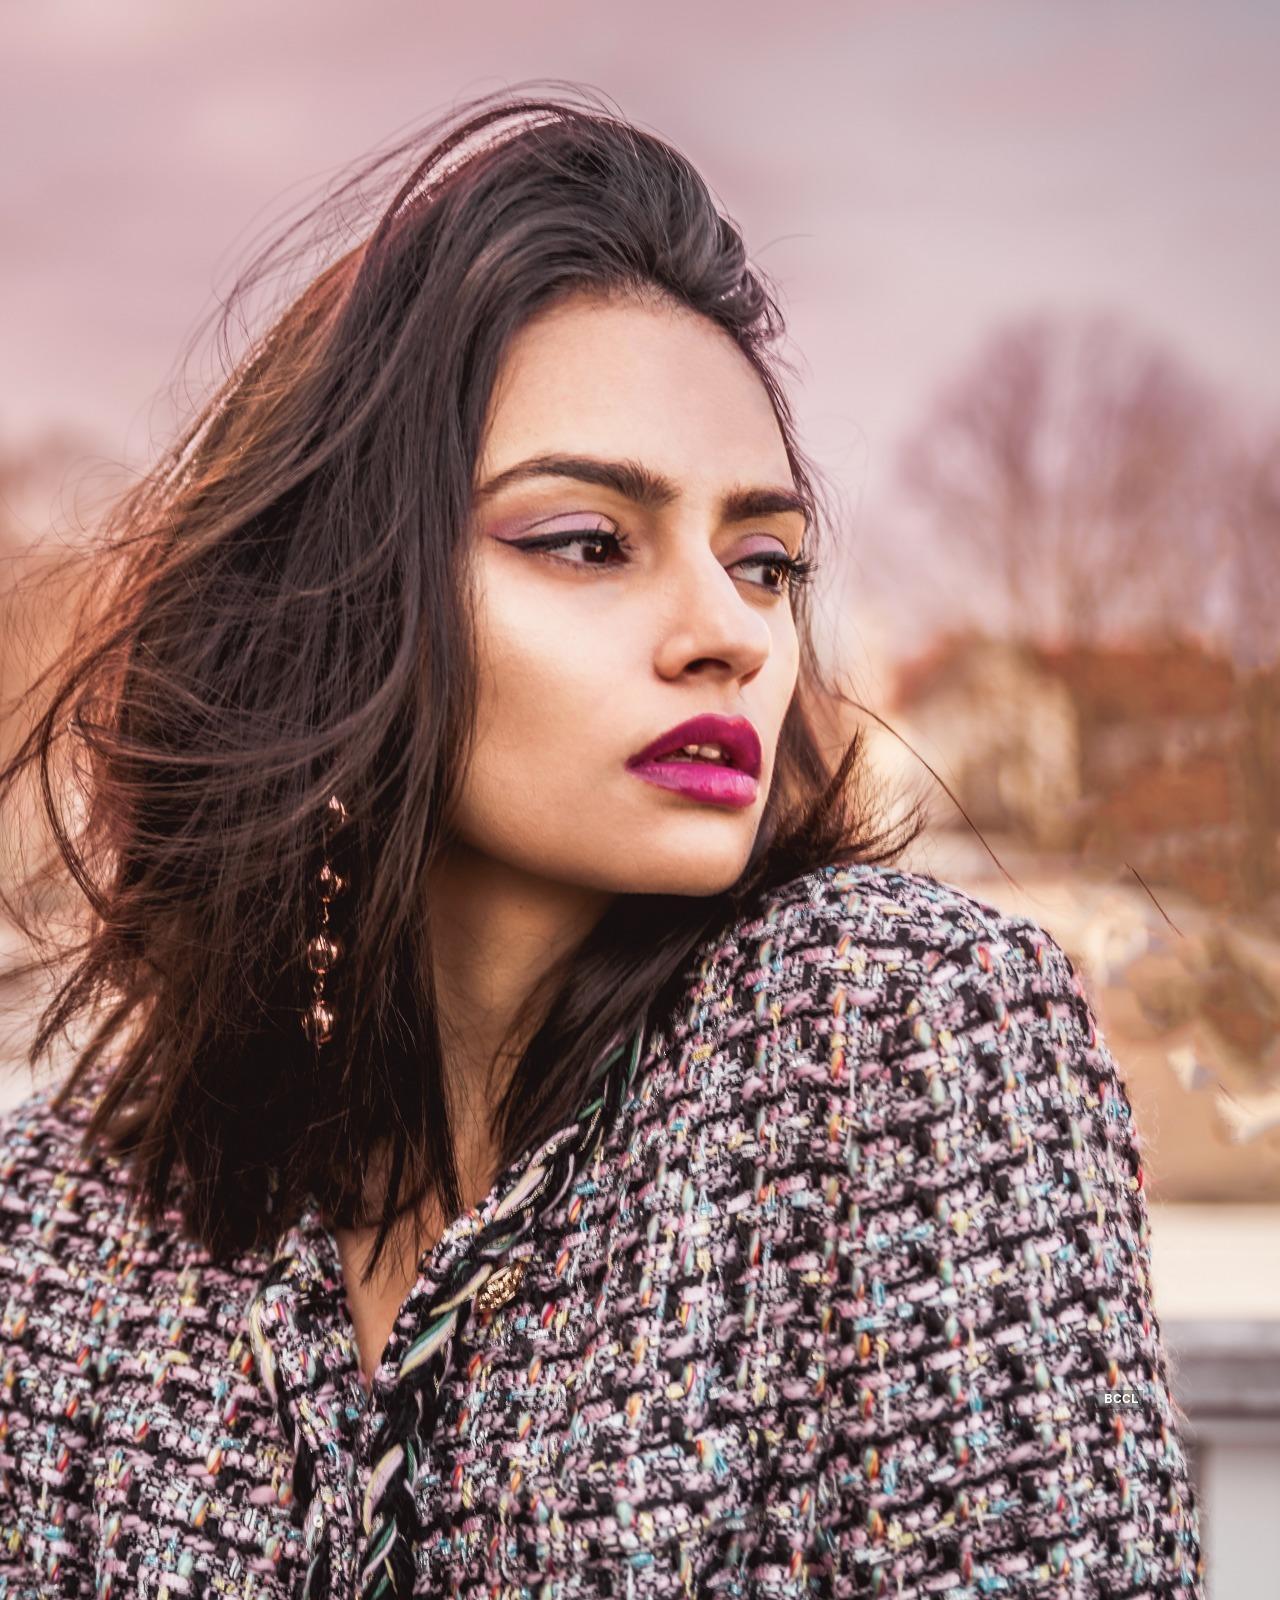 Meet the gorgeous Shraddha Singh, a 'Coder-turned-Creative' blogger & model